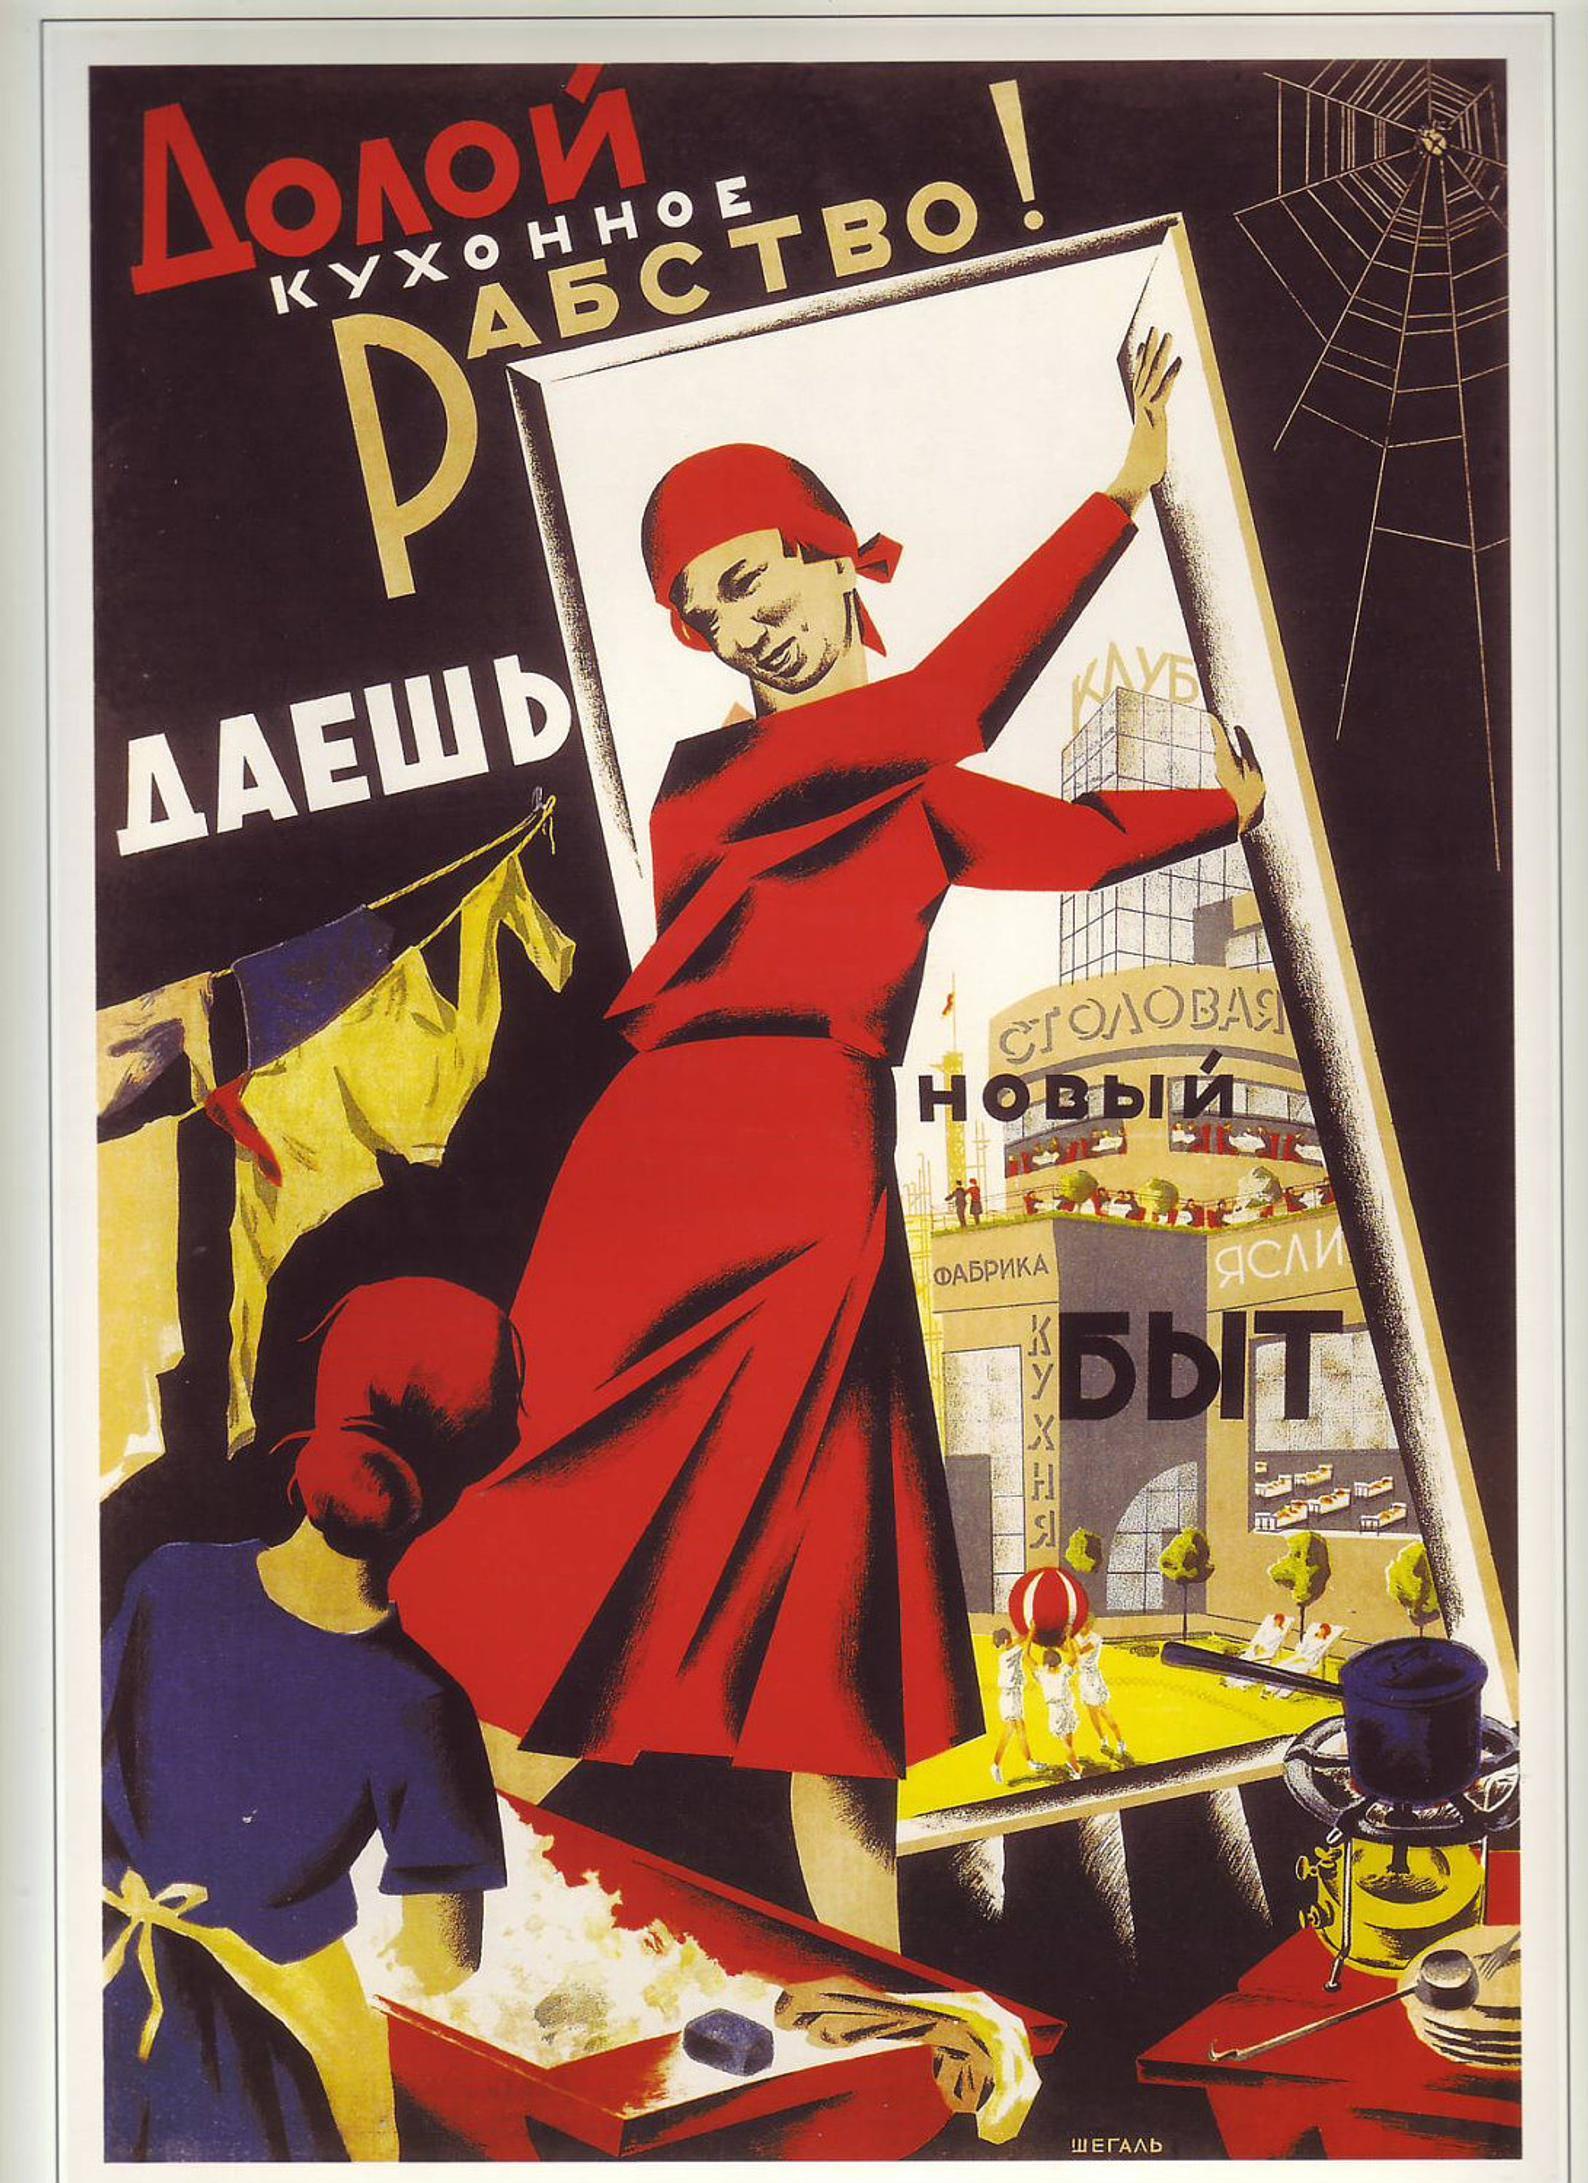 Плакат Г.М. Шегаля «Долой кухонное рабство! Даёшь новый быт!» (1931)